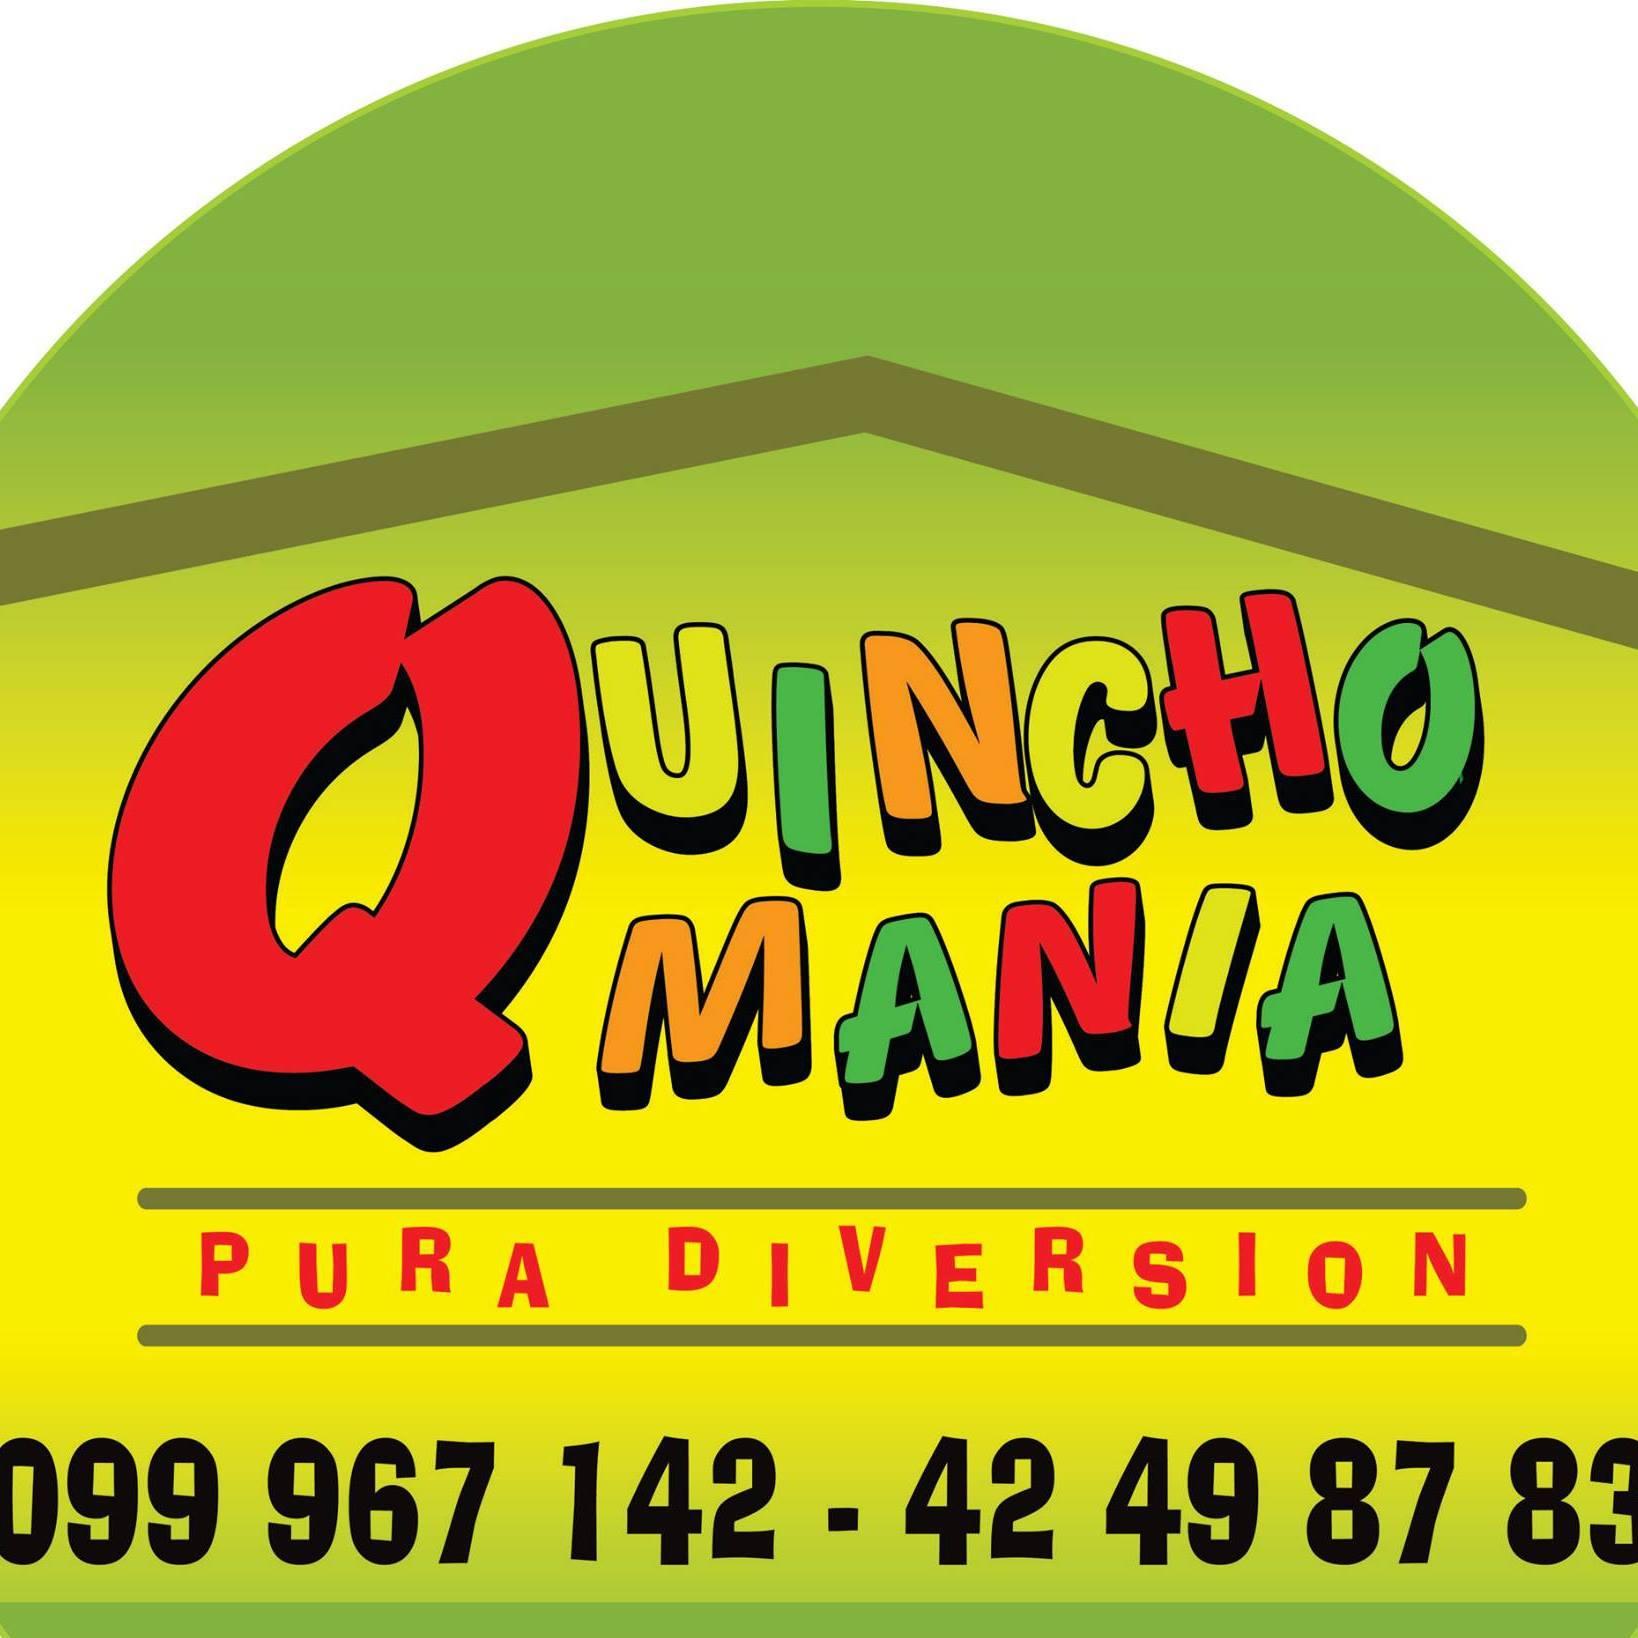 logo-salon-de-fiestas-quinchomania